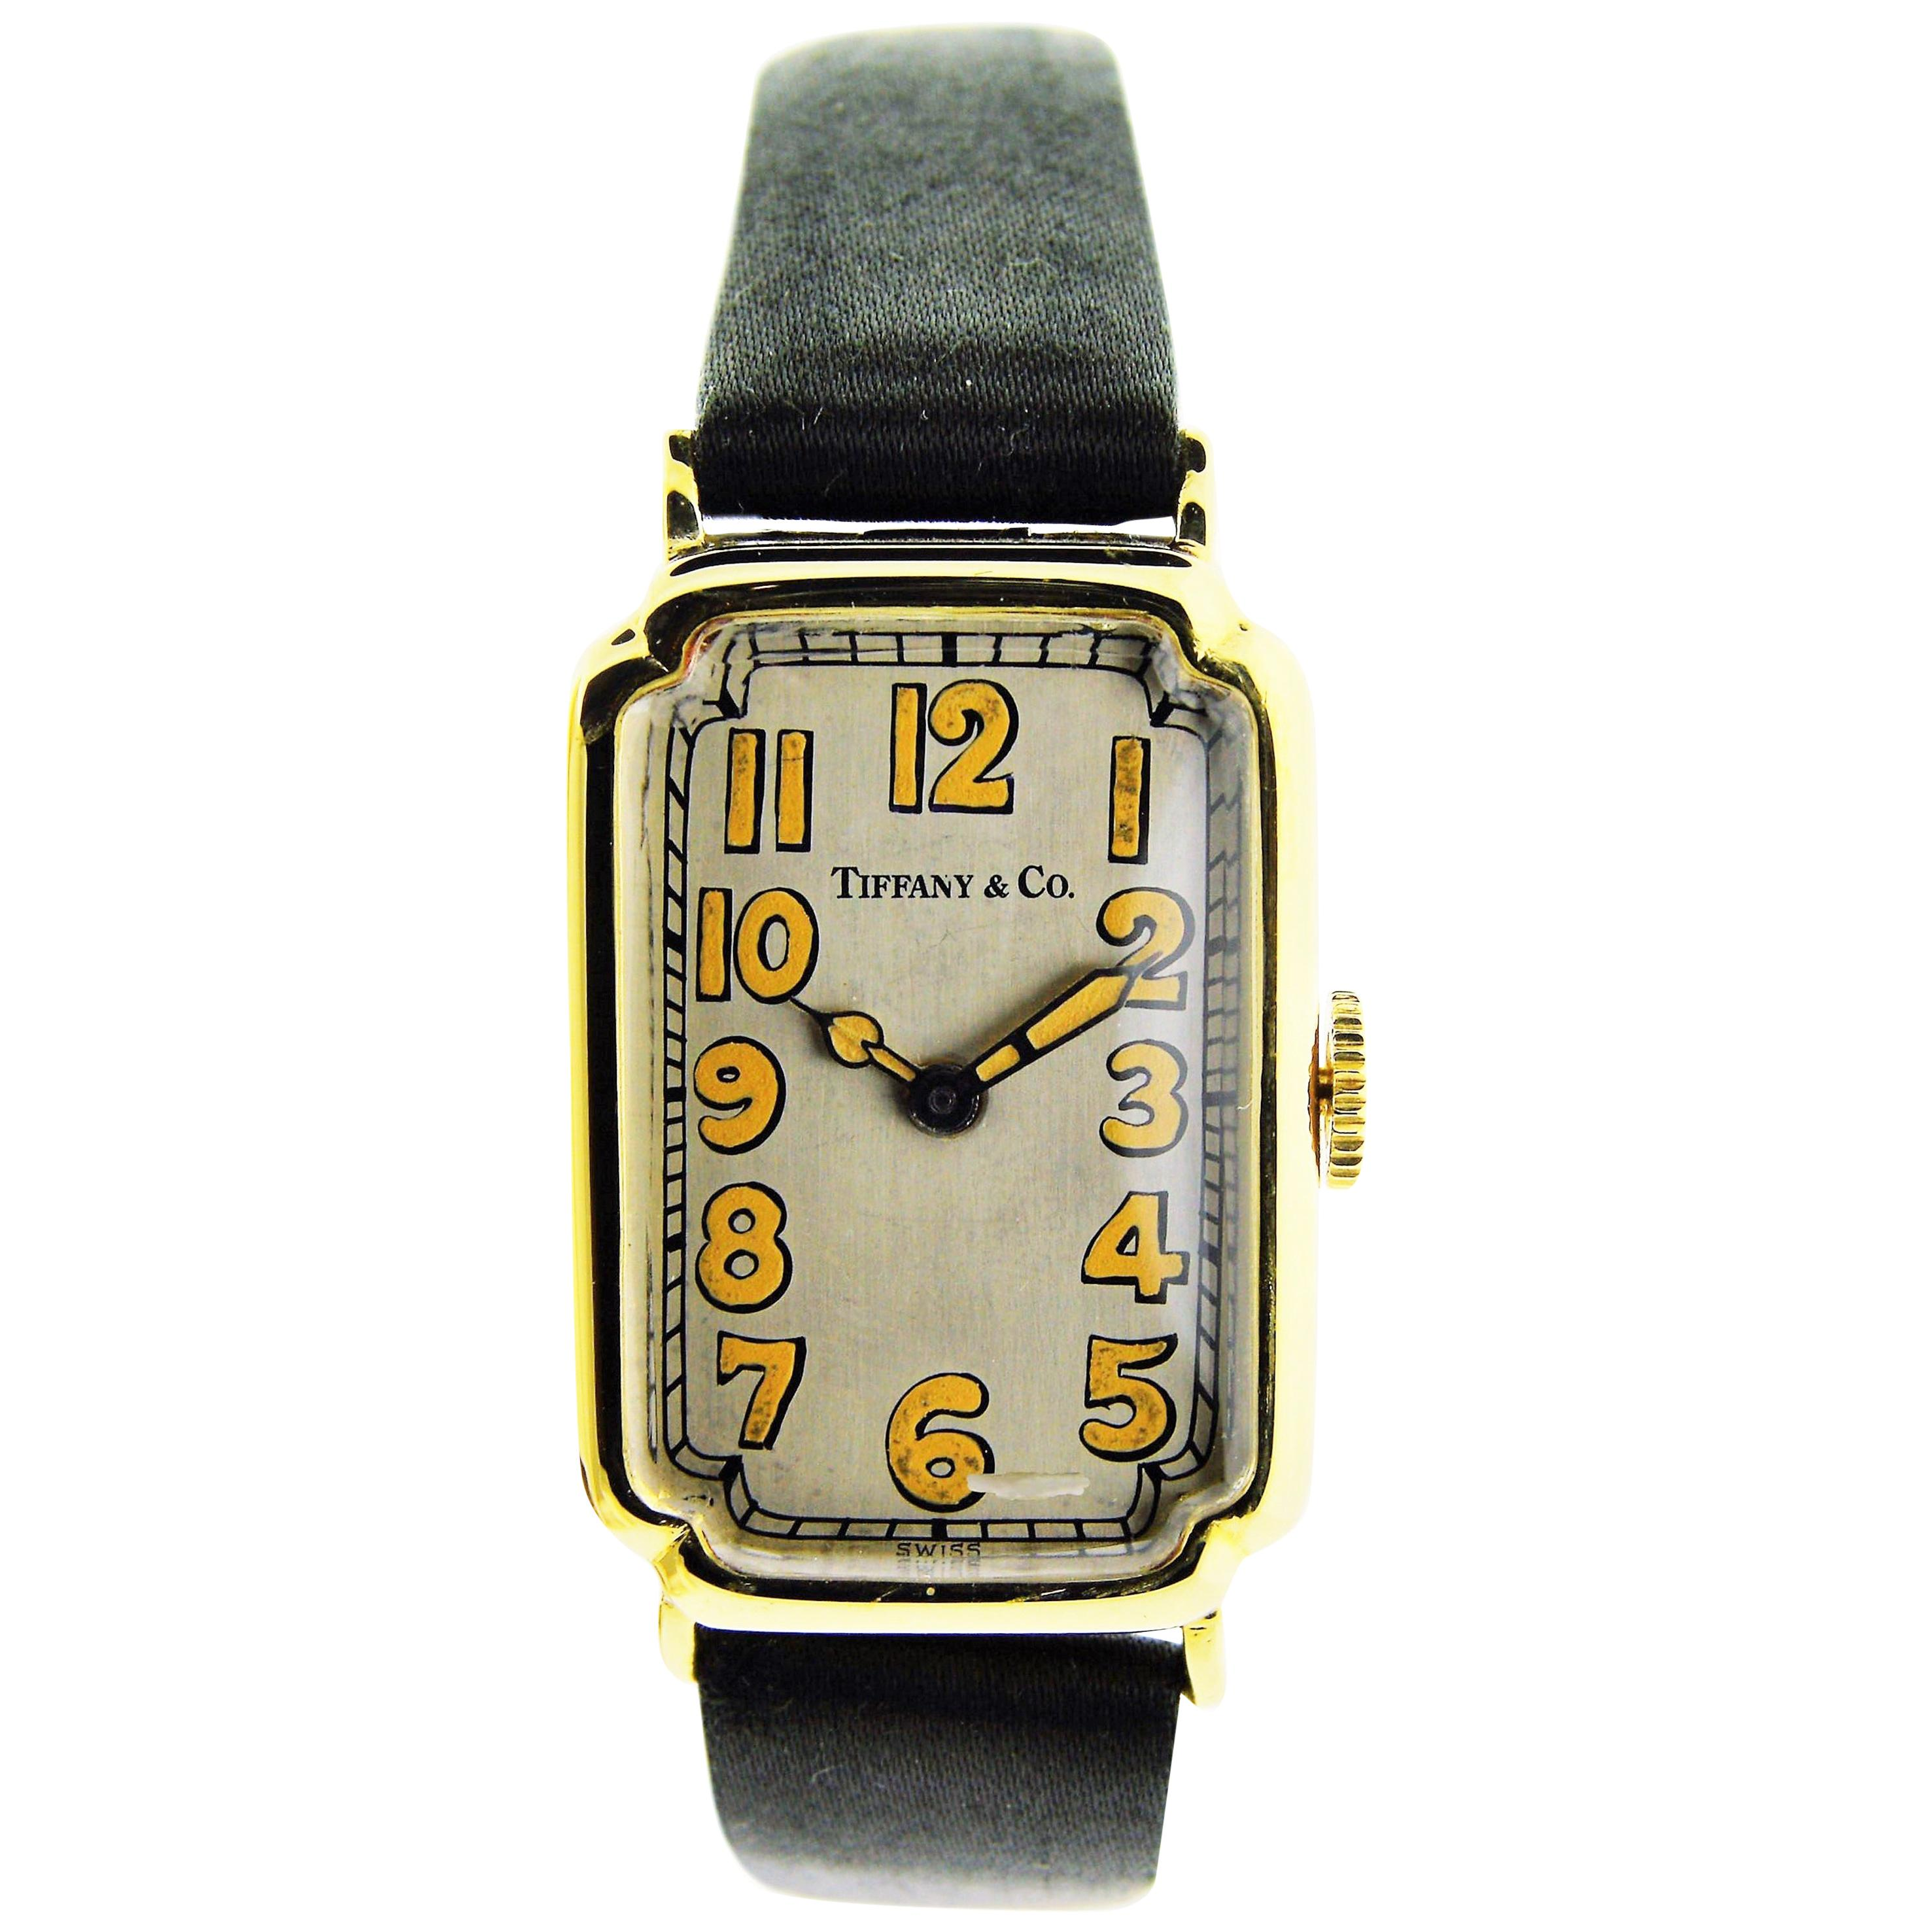 Tiffany & Co. Art Deco Yellow Gold Manual Wind Watch, circa 1930s